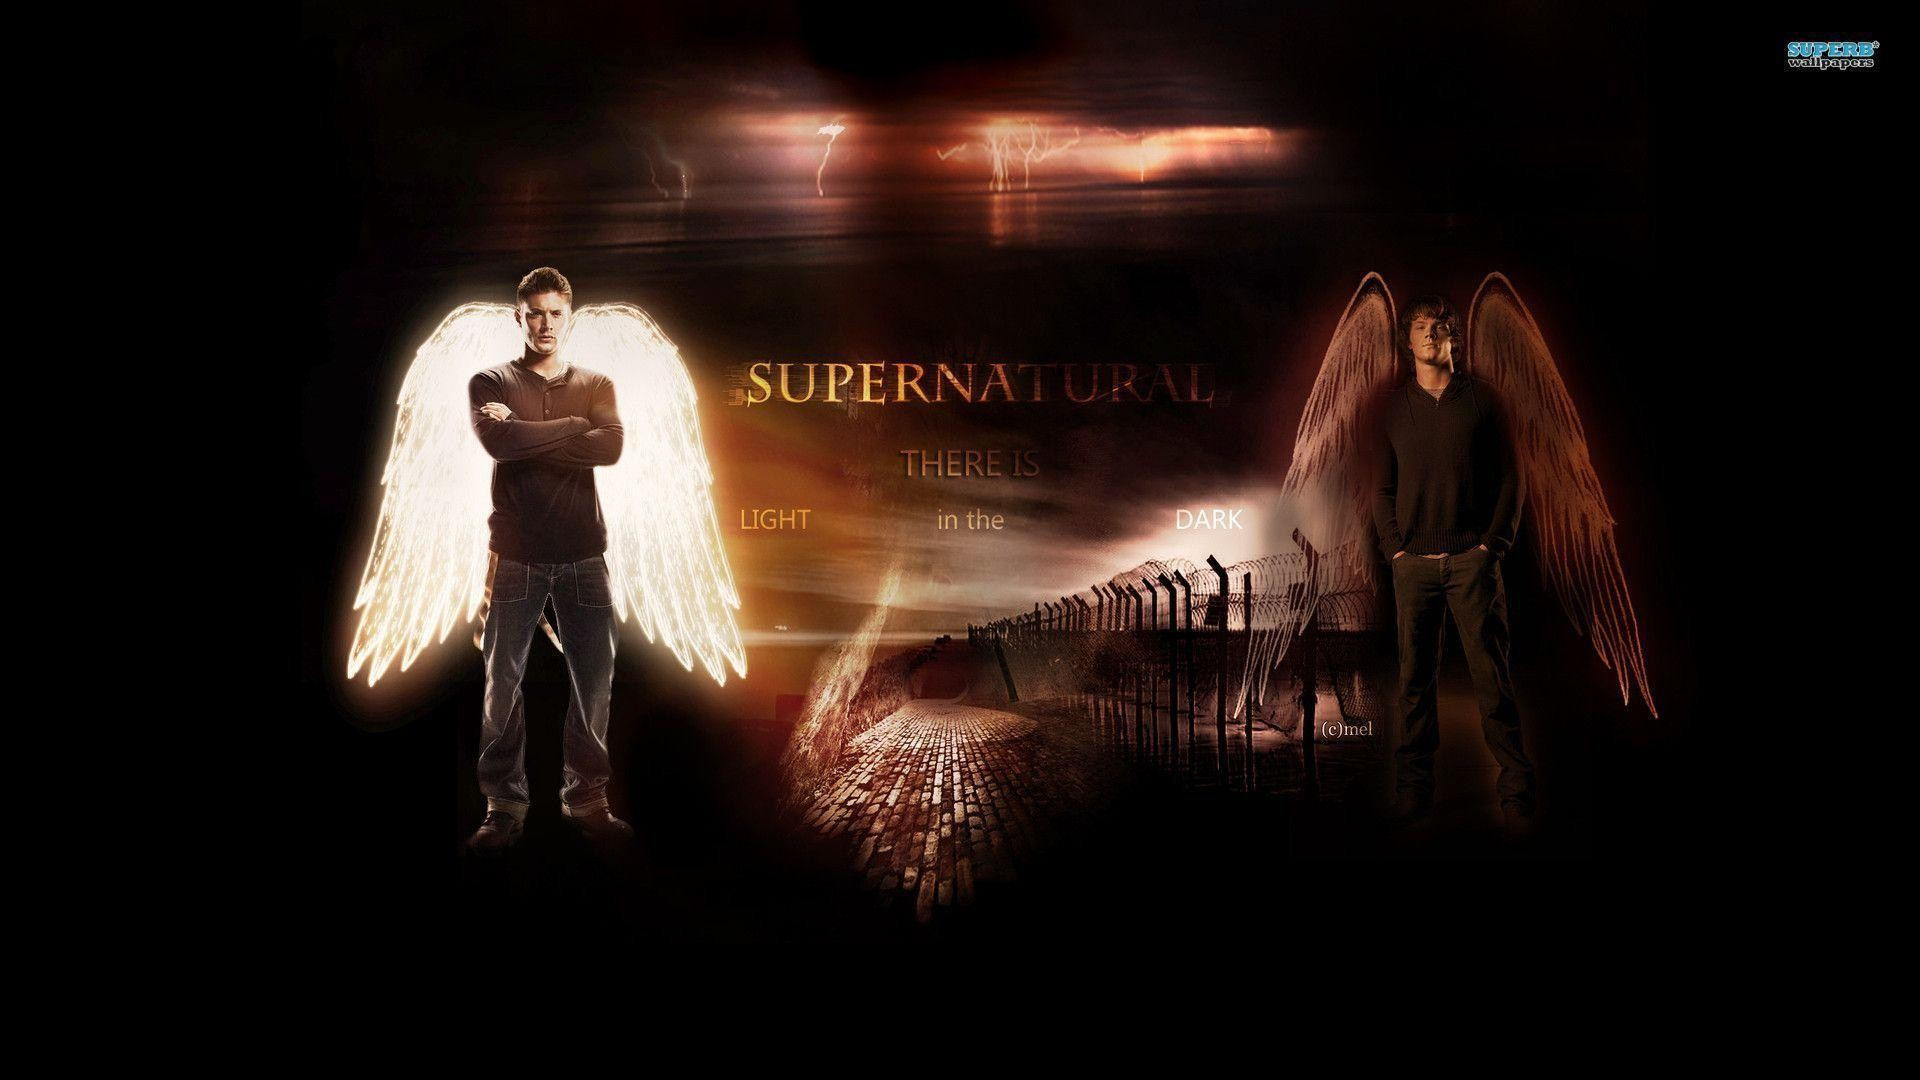 Supernatural Screensavers Posted By Samantha Walker